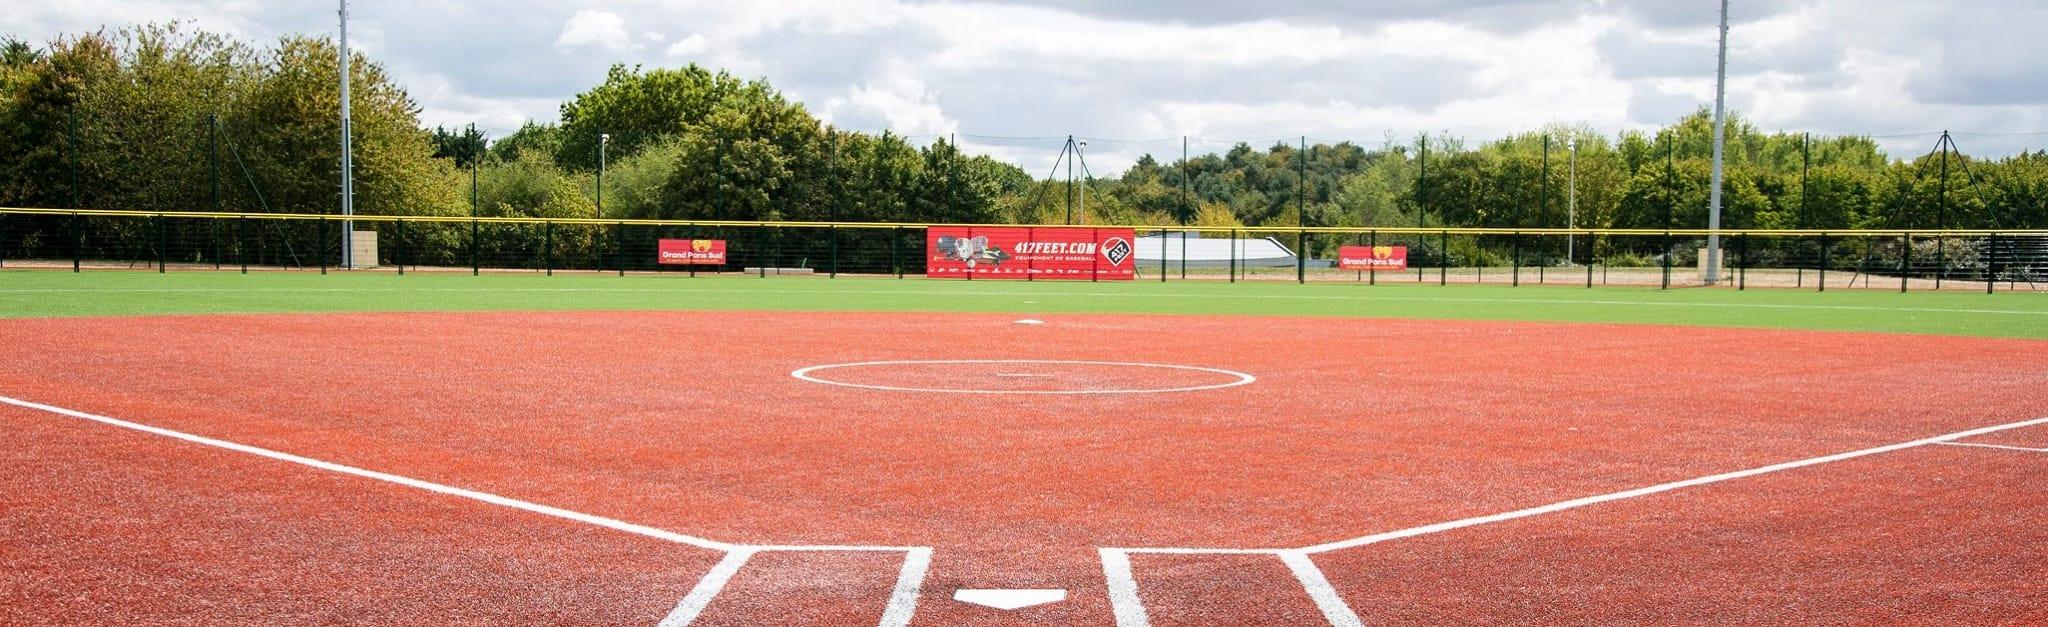 AS Evry Baseball Softball Cricket